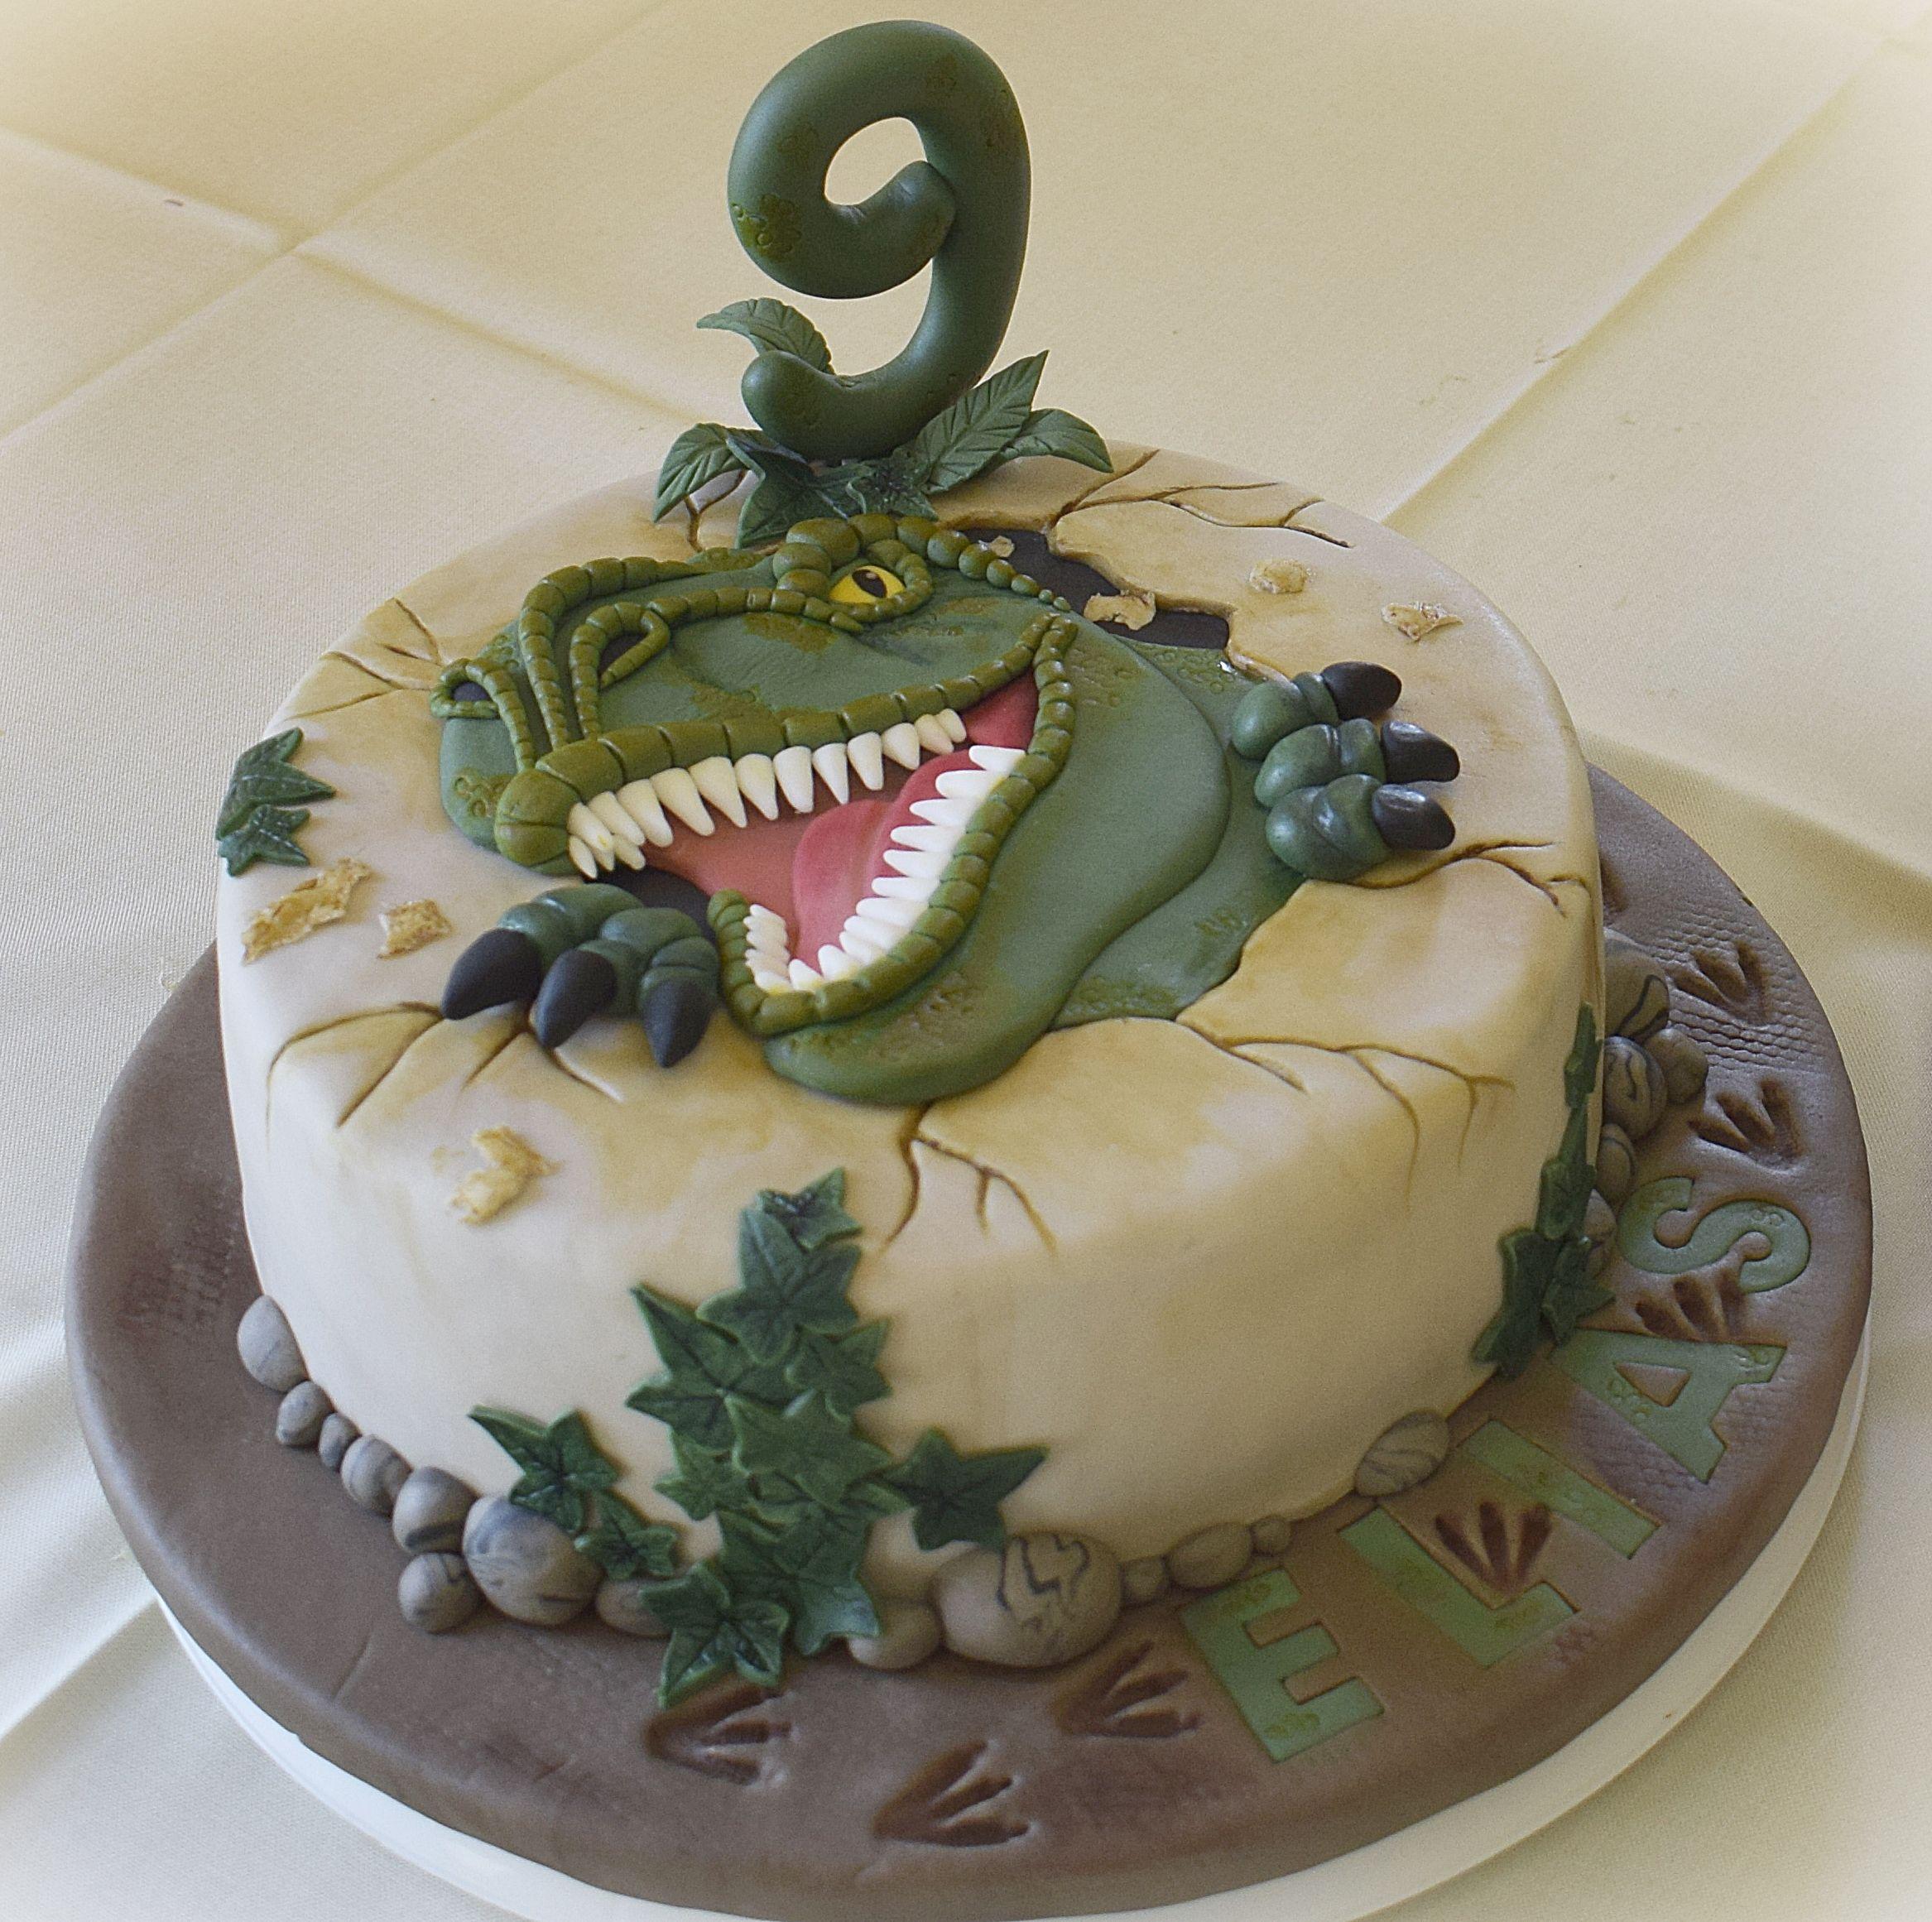 Cake Kuchen Backen Fondanttorte Fondant Torte T Rex Dino Torte Dinotorte Kuchen Kuchen Und Torten Kuchen Ohne Backen